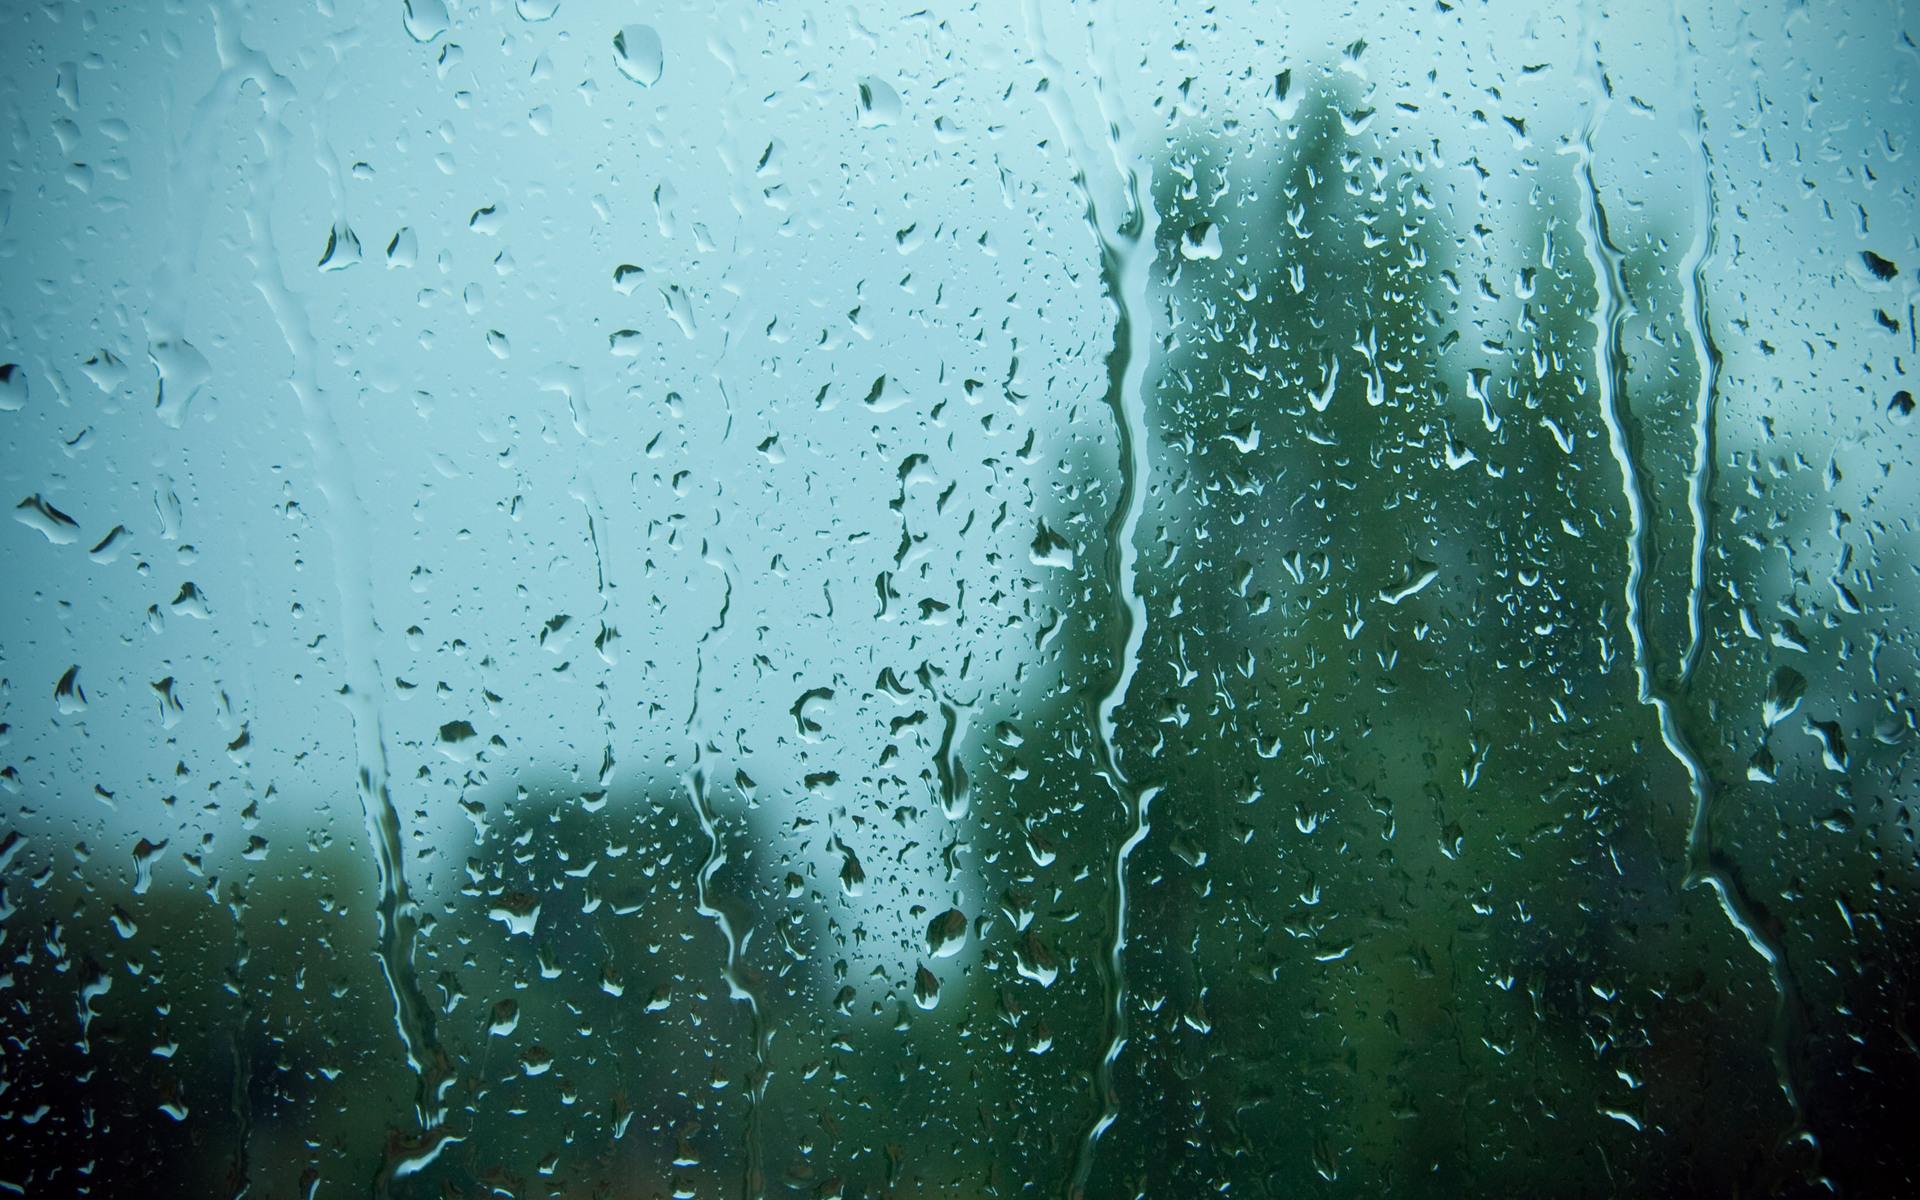 Rain On Window Wallpaper